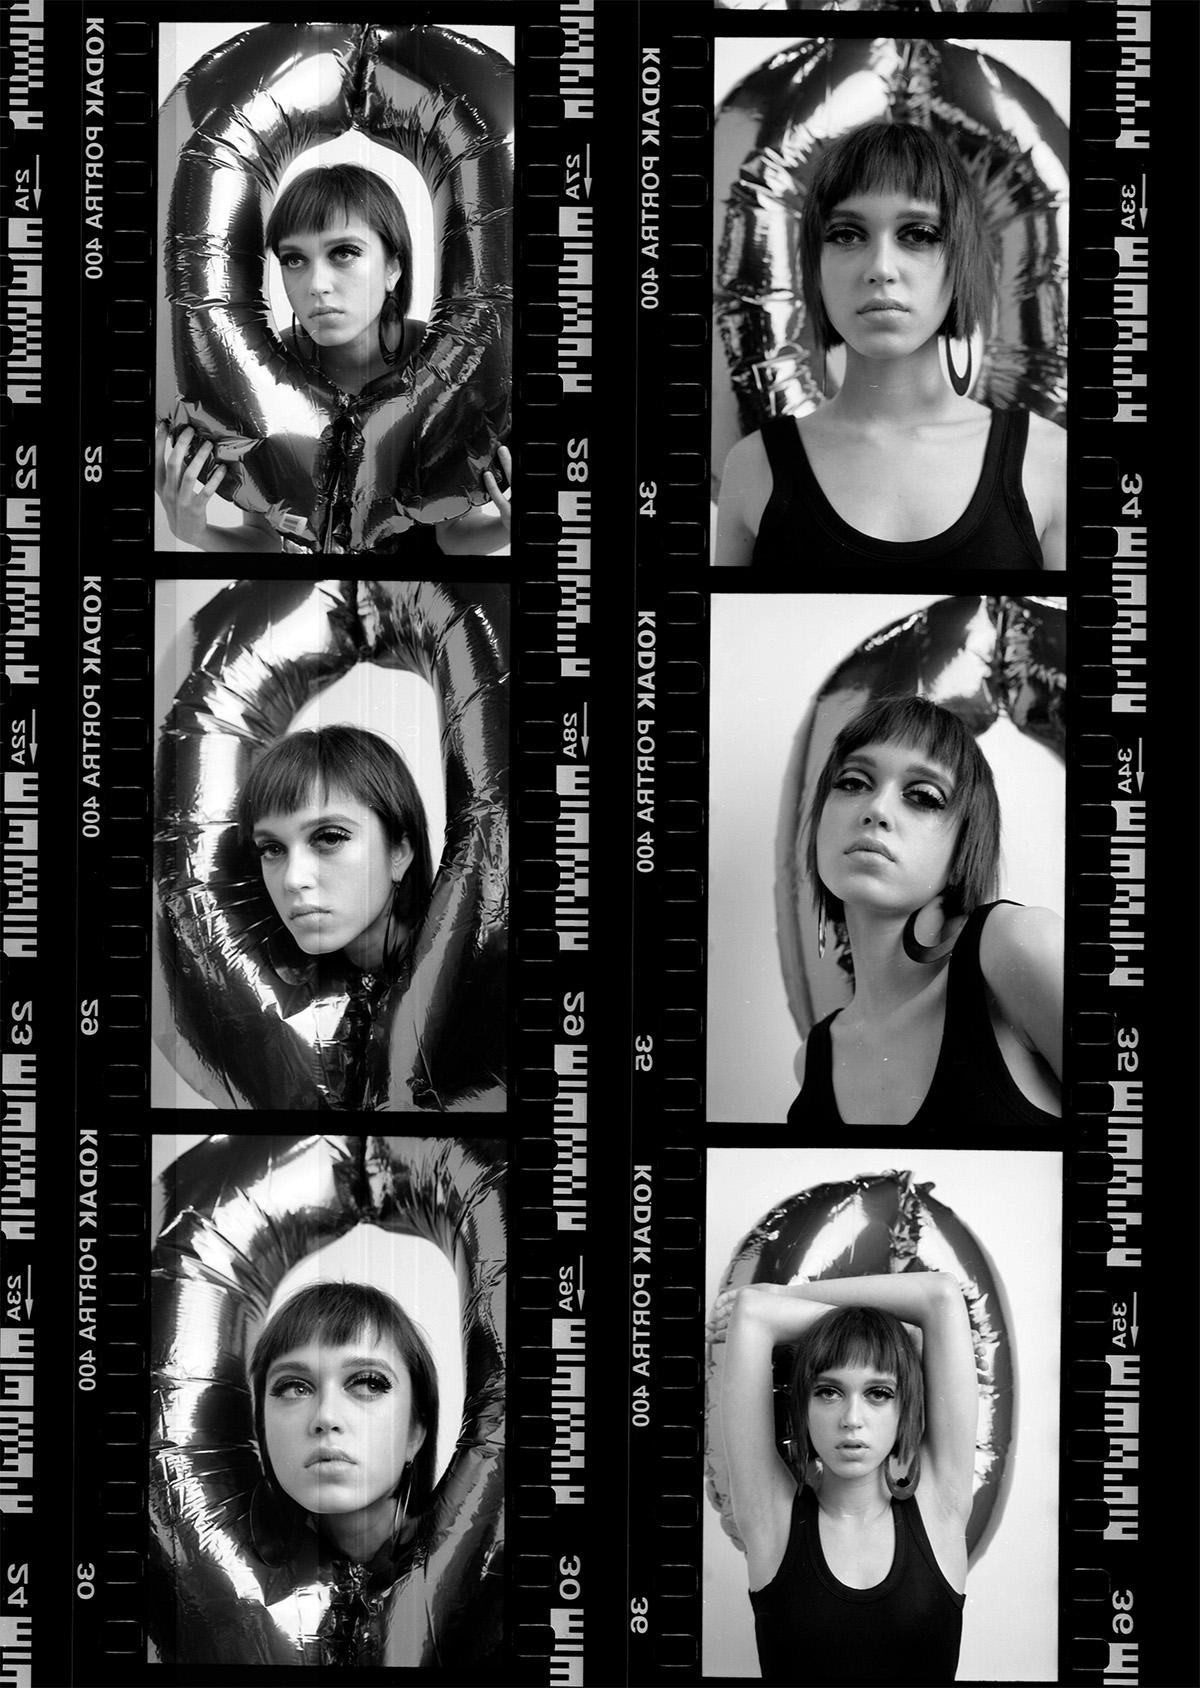 Photography by   Antonio Eugenio     Fashion by     Joshua James Small     MUA by   Yuuki Yanase     Photographer Assistant   Sebek Lark   Talent   Turgay Cakli     at     Nii Agency